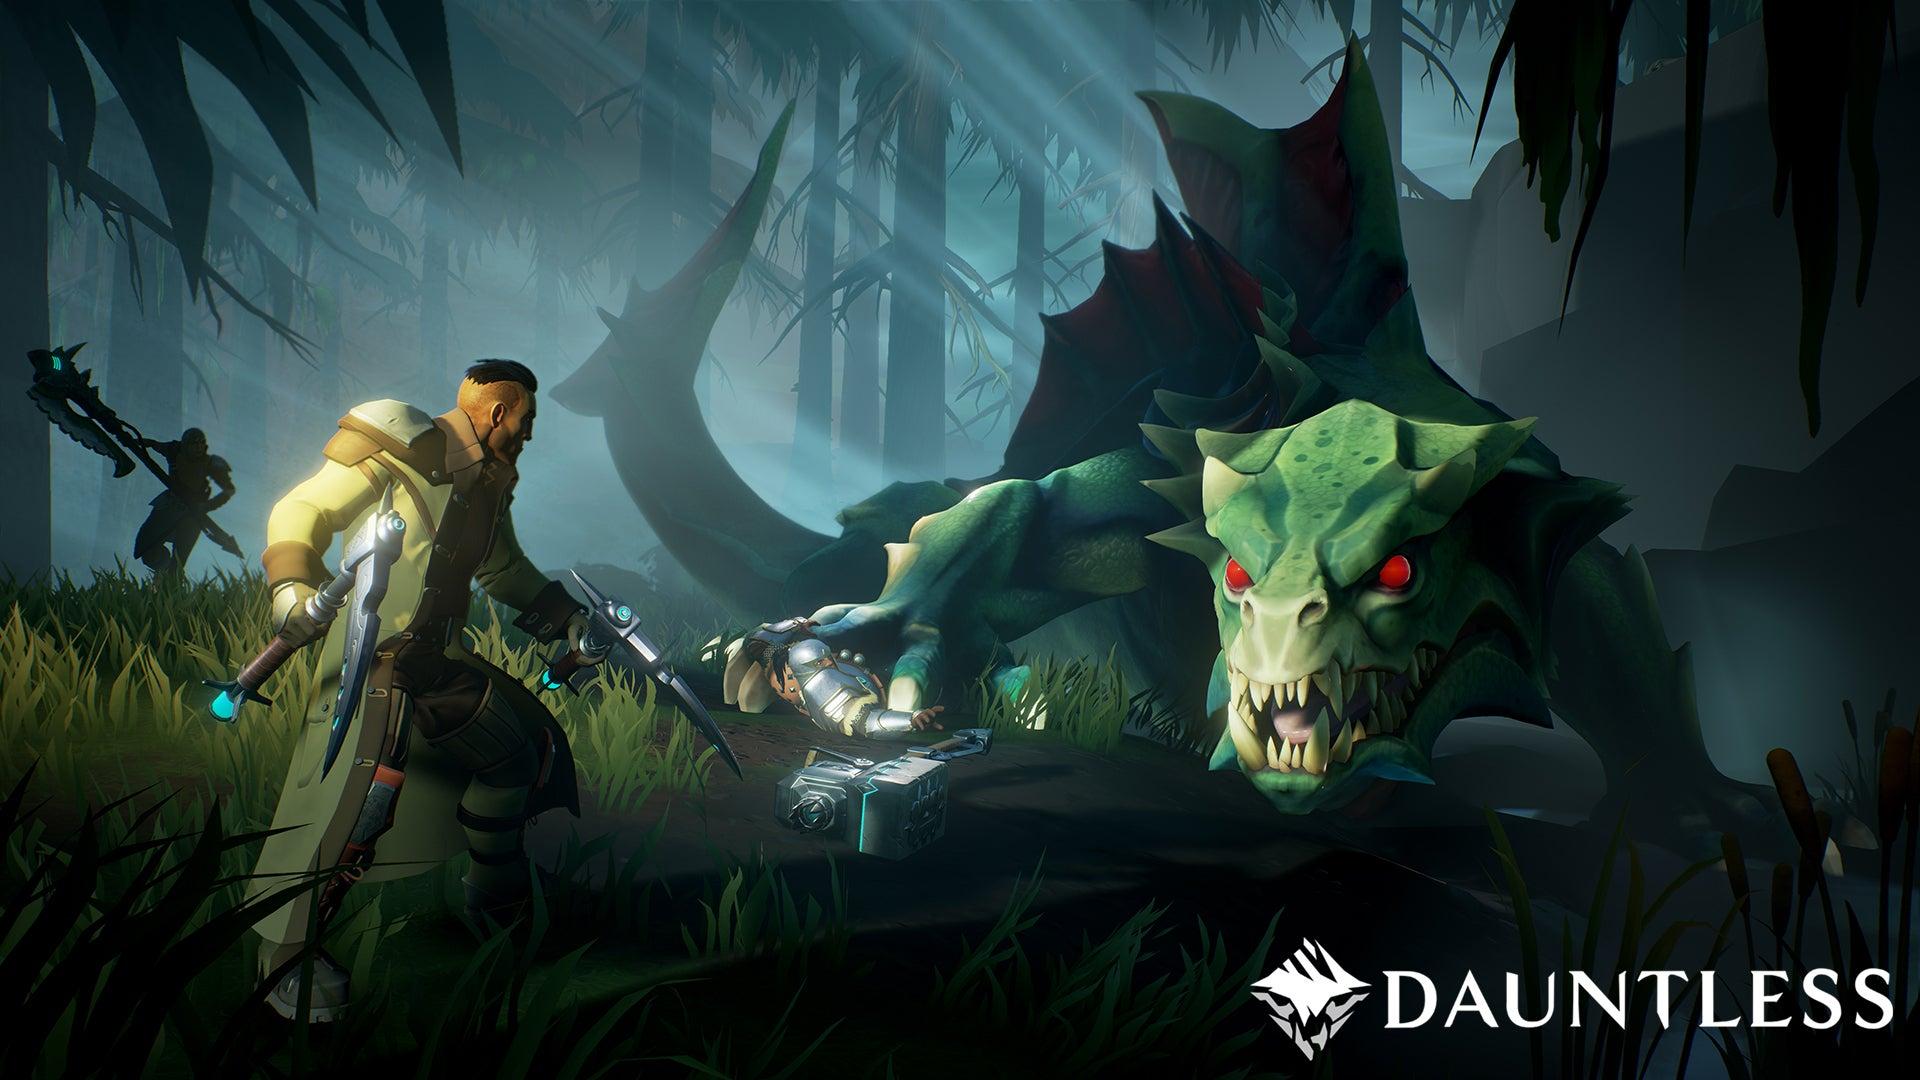 Image for Dauntless looks like Fortnite via Monster Hunter, heading into open beta in May